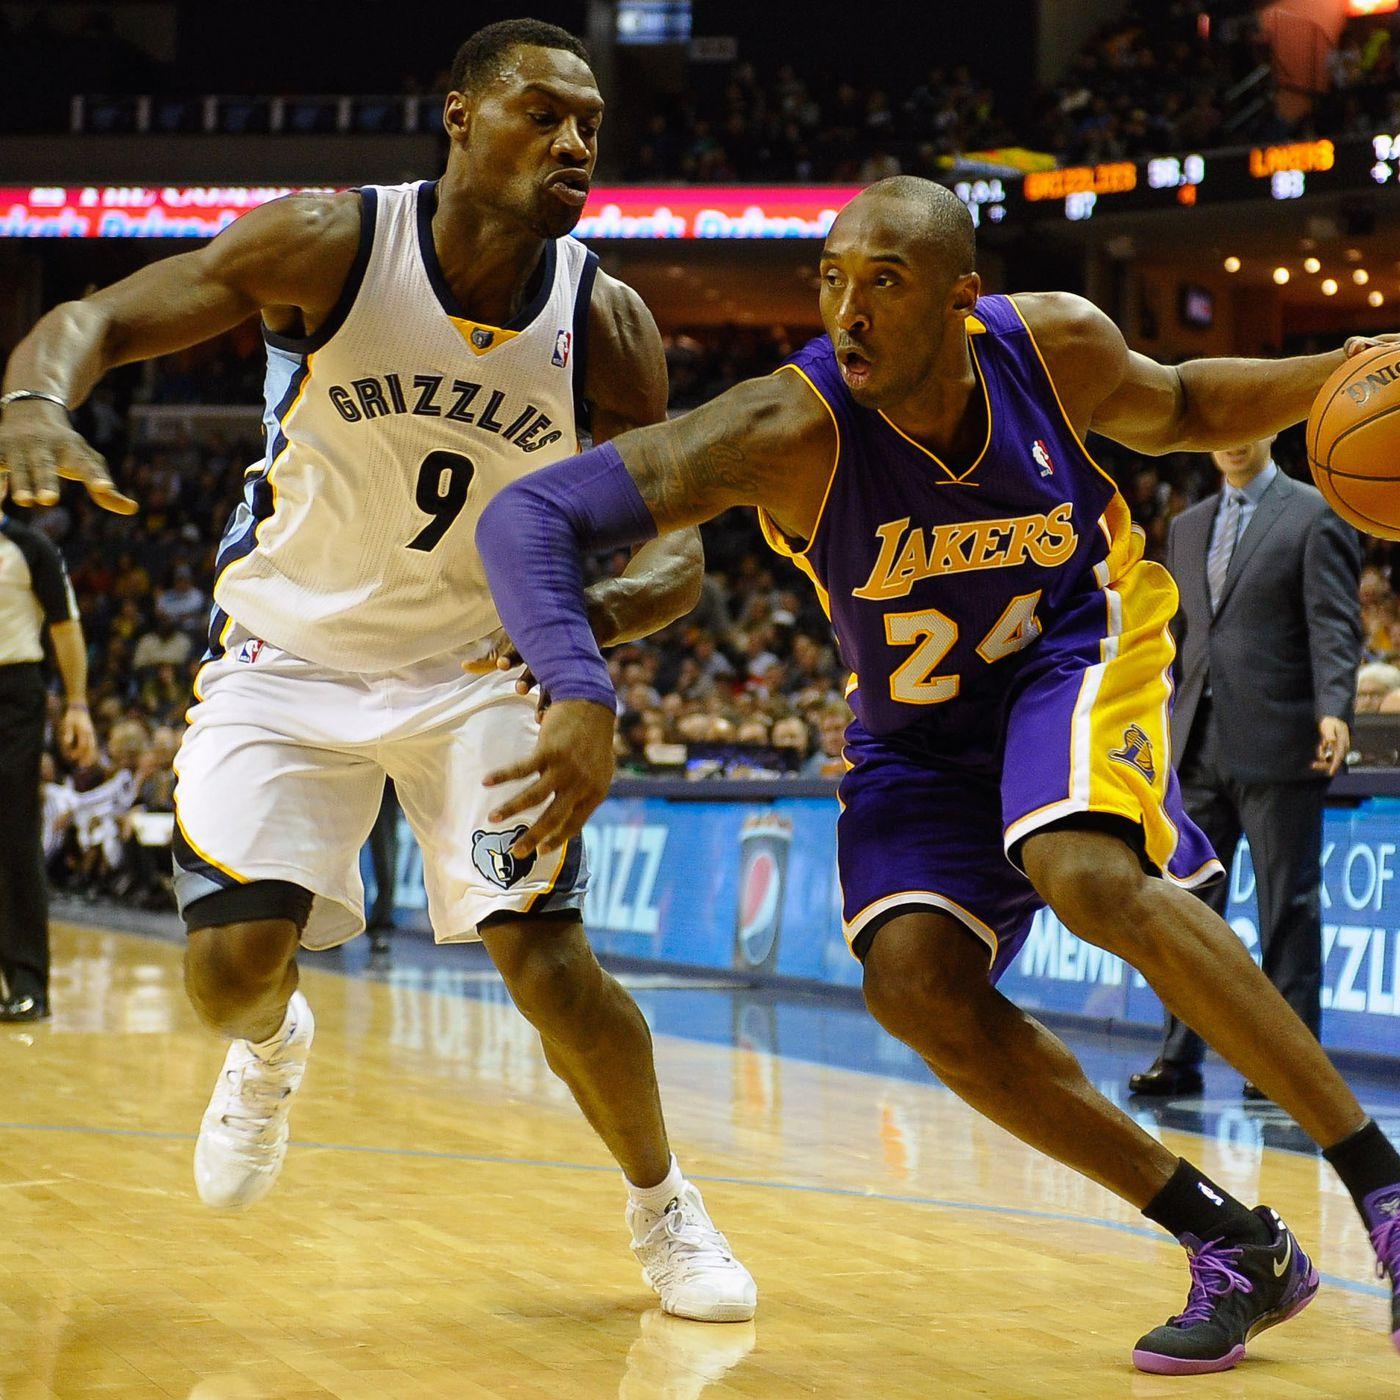 99a438b3b5be Kobe Bryant reveals who the real  Kobe stopper  was - SBNation.com